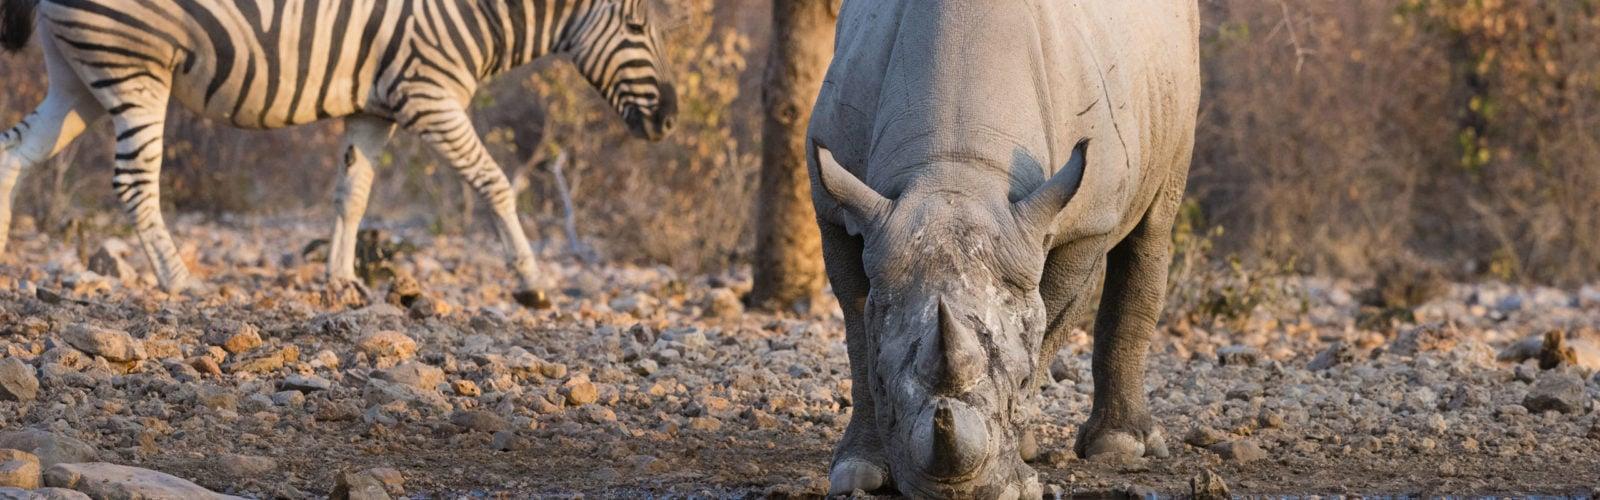 Ongava Reserve Namibia Zebra Rhinoceros